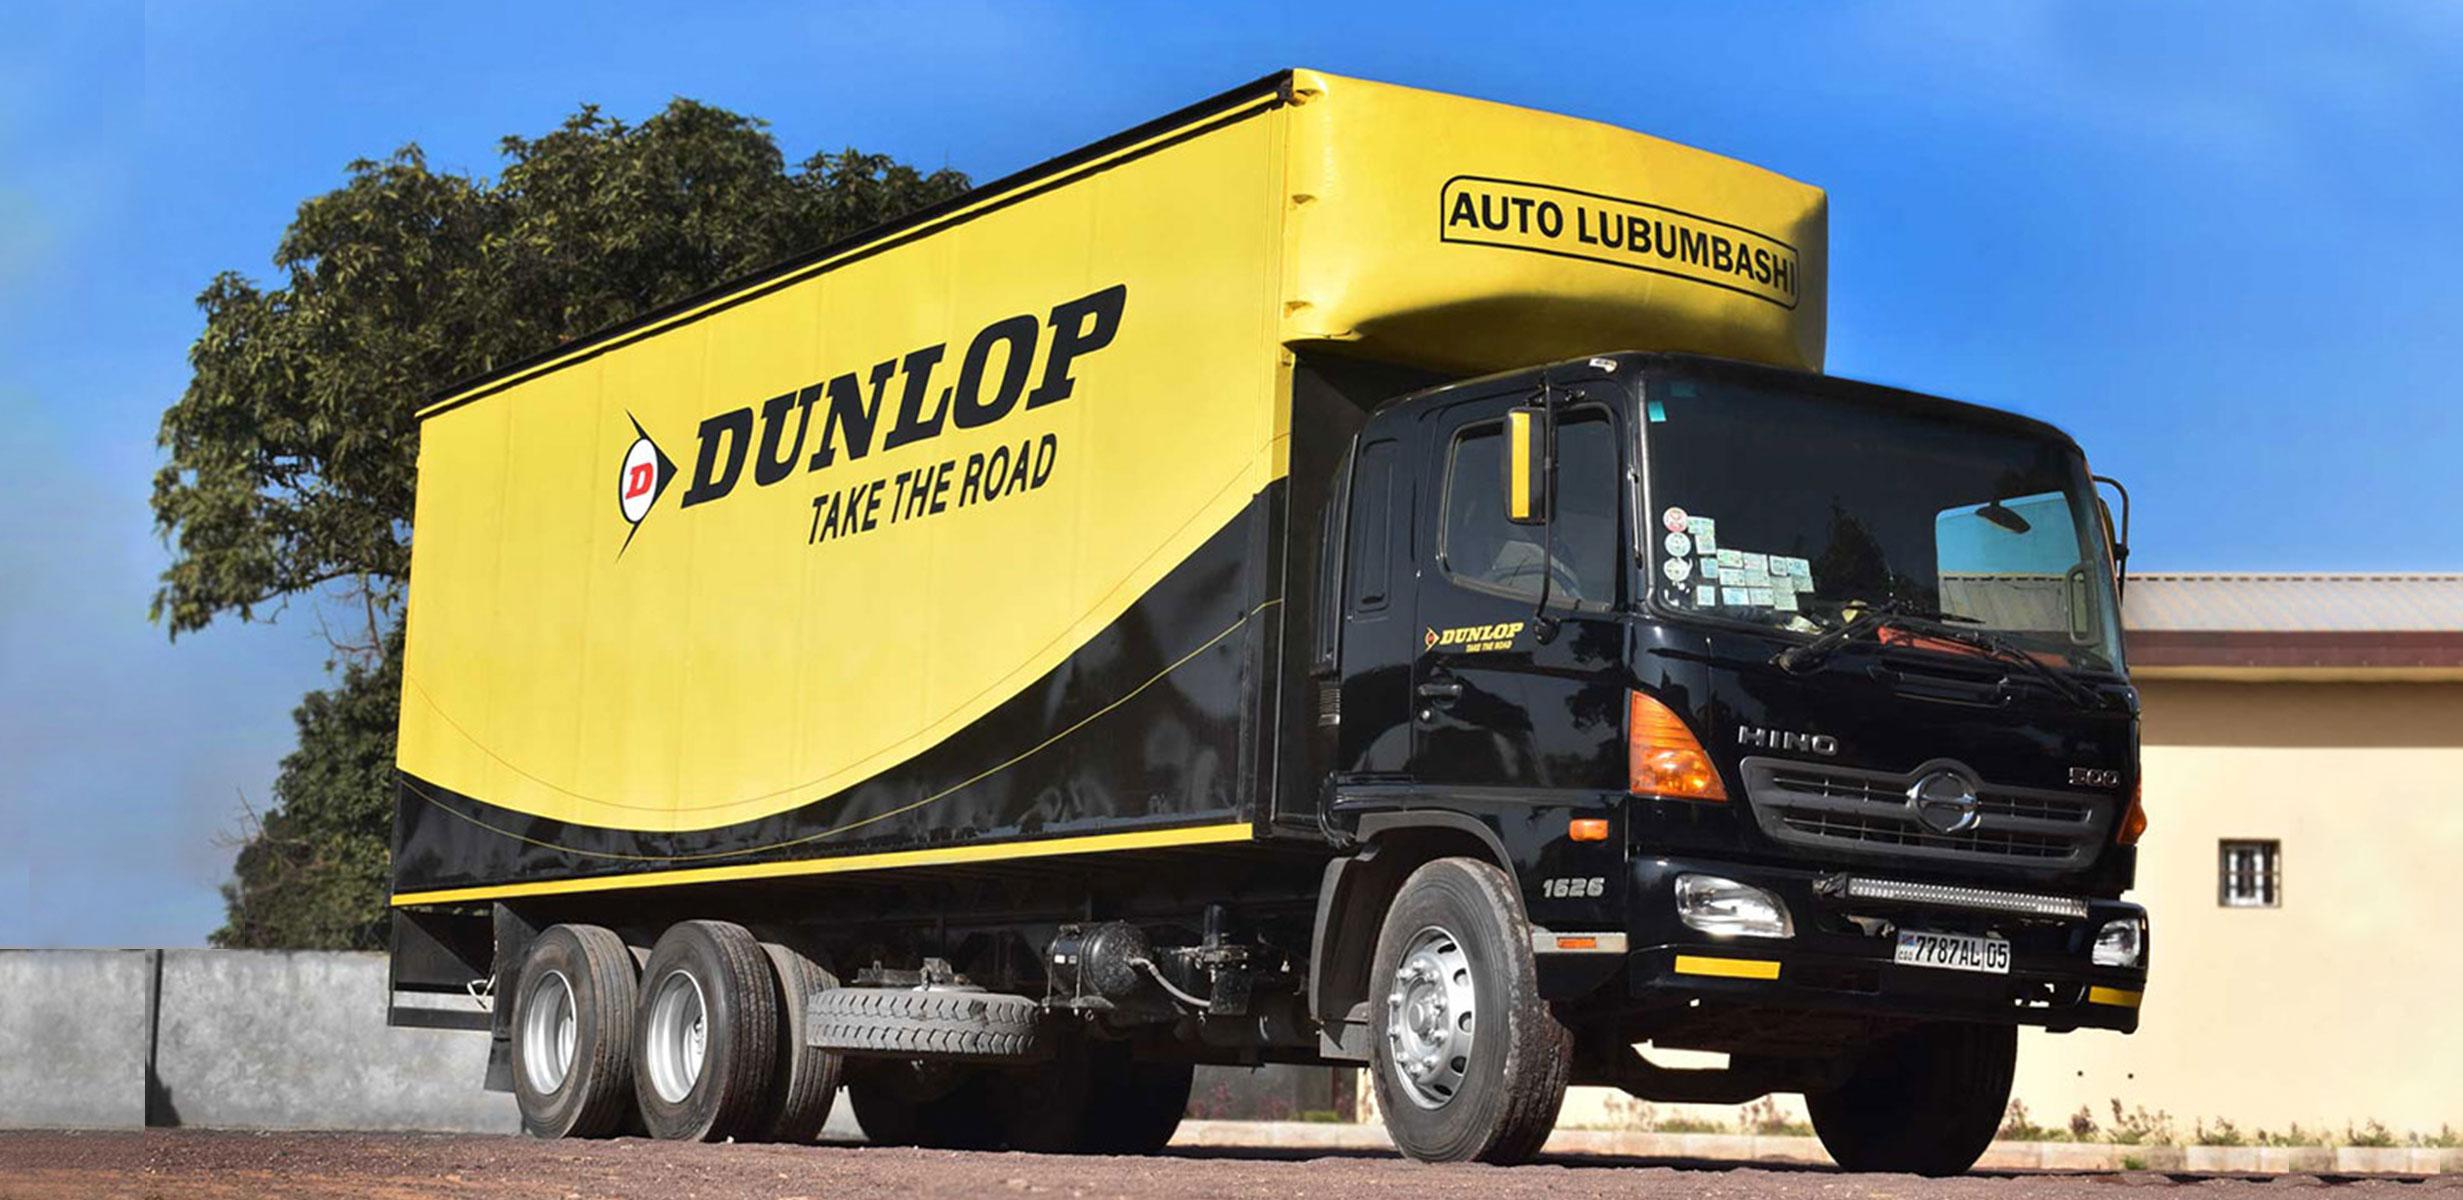 Auto Lubumbashi Trucks